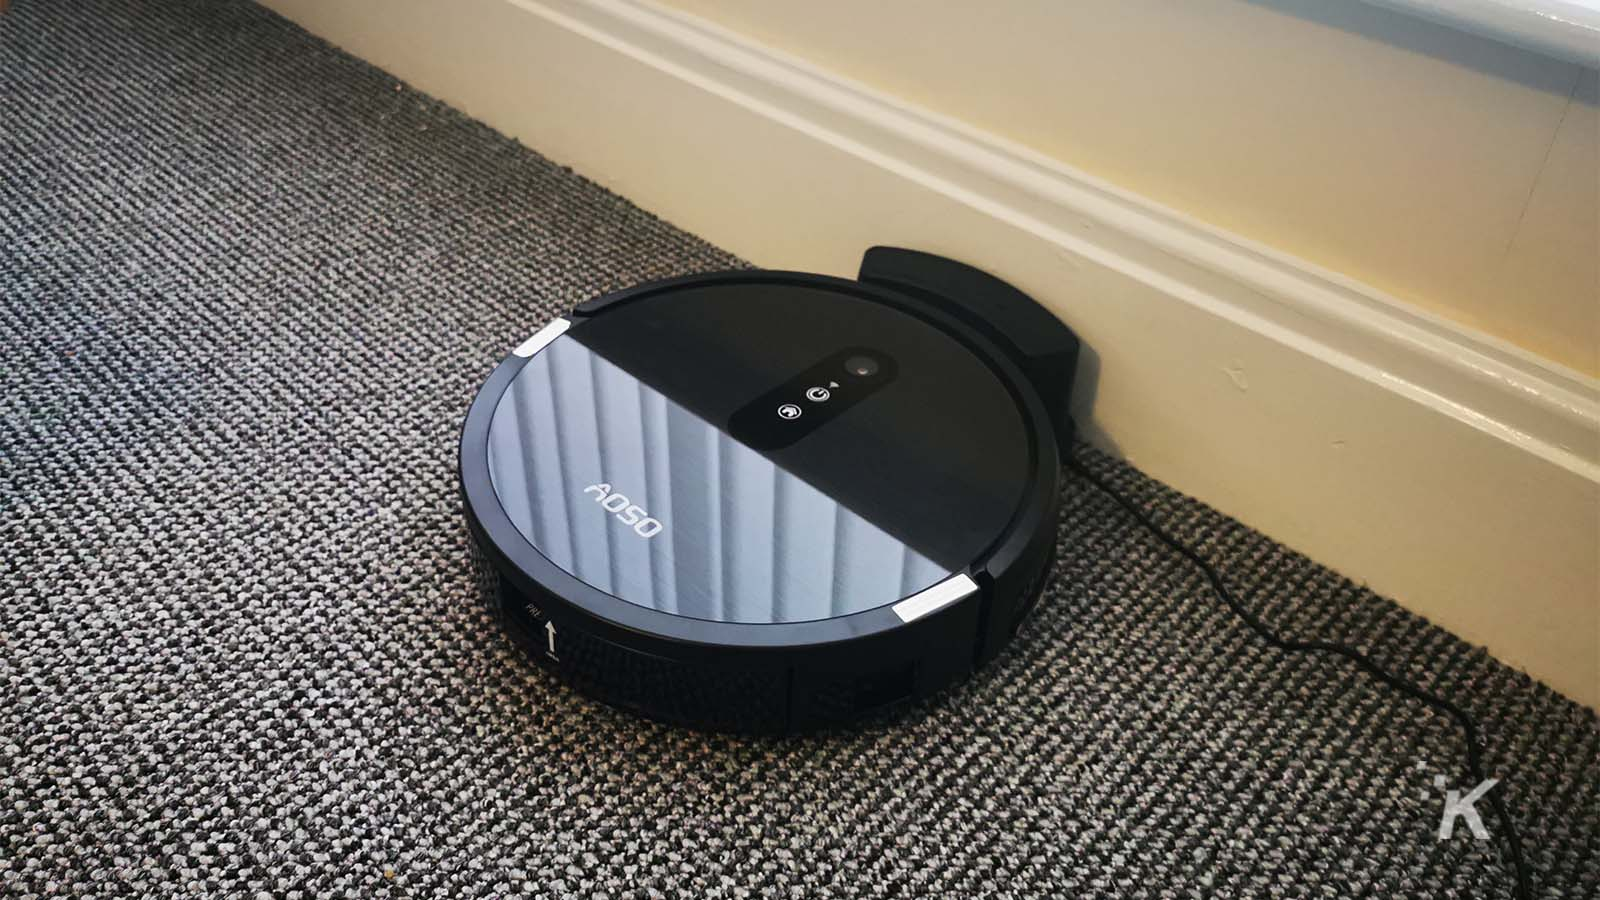 Shiny AOSO S3 robot vacuum